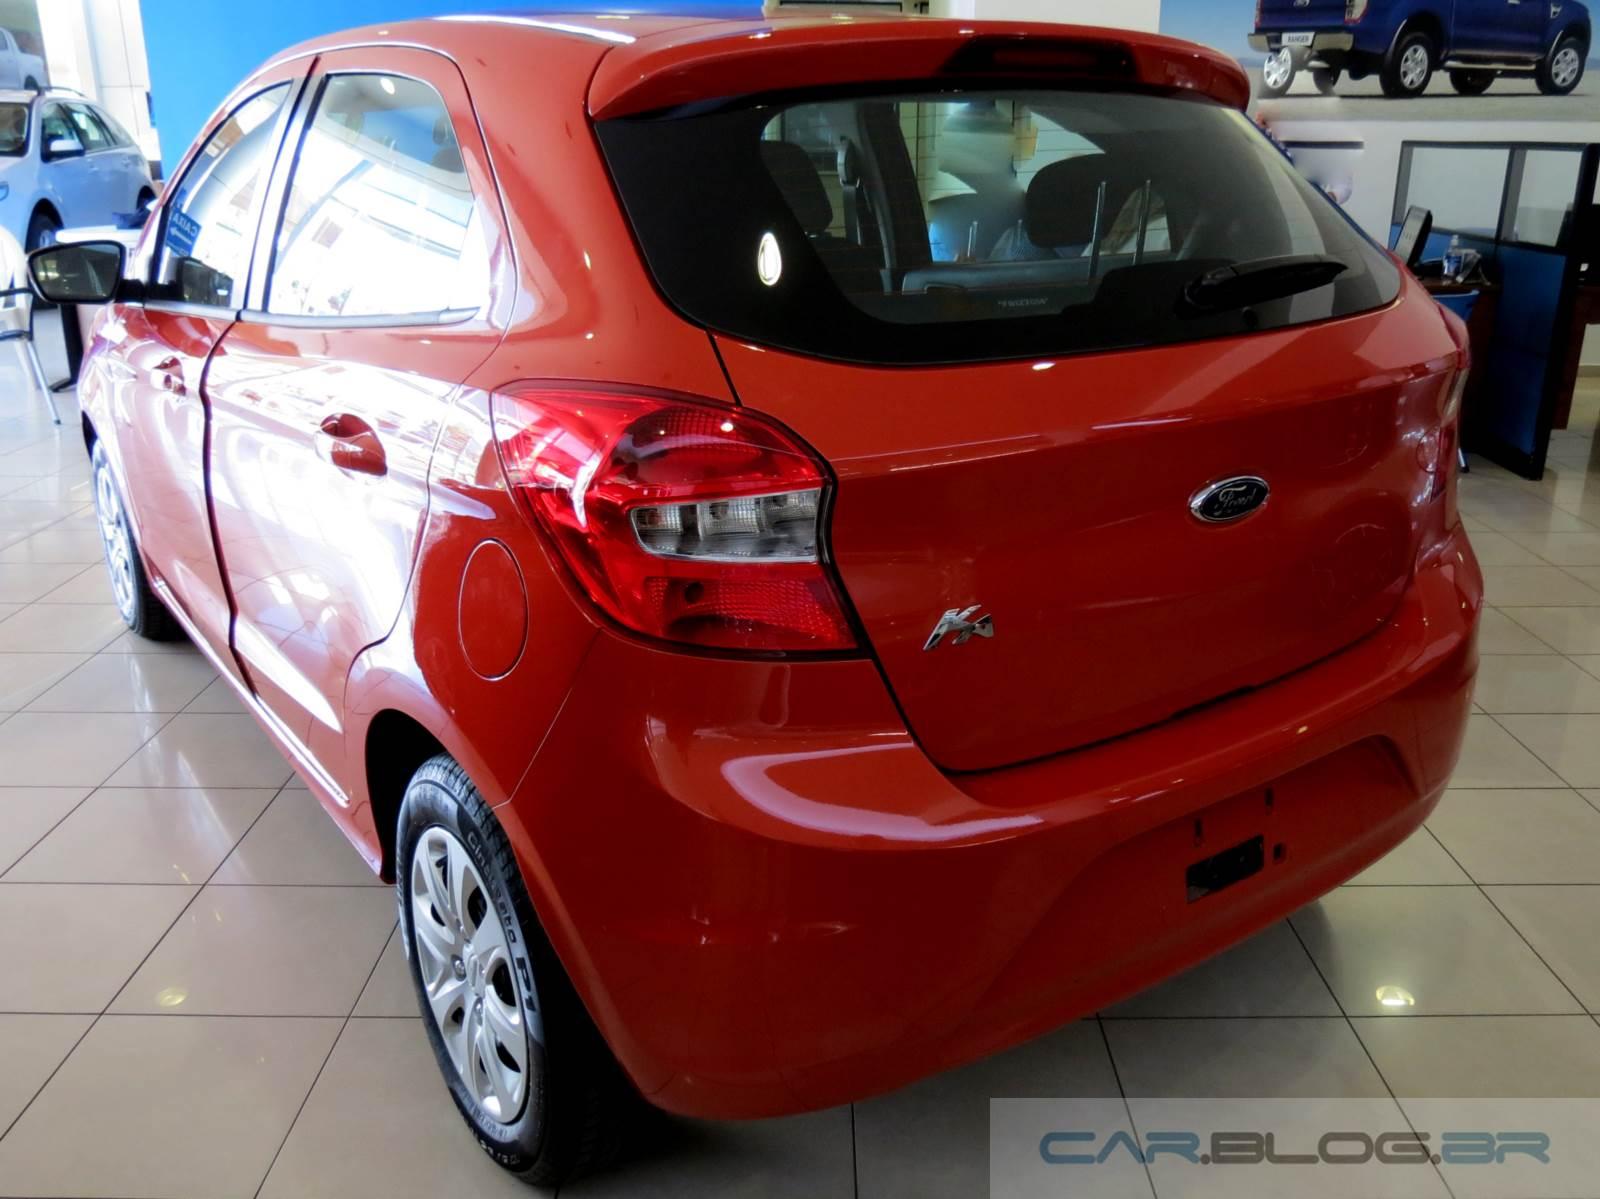 Novo ford ka 2015 vermelho